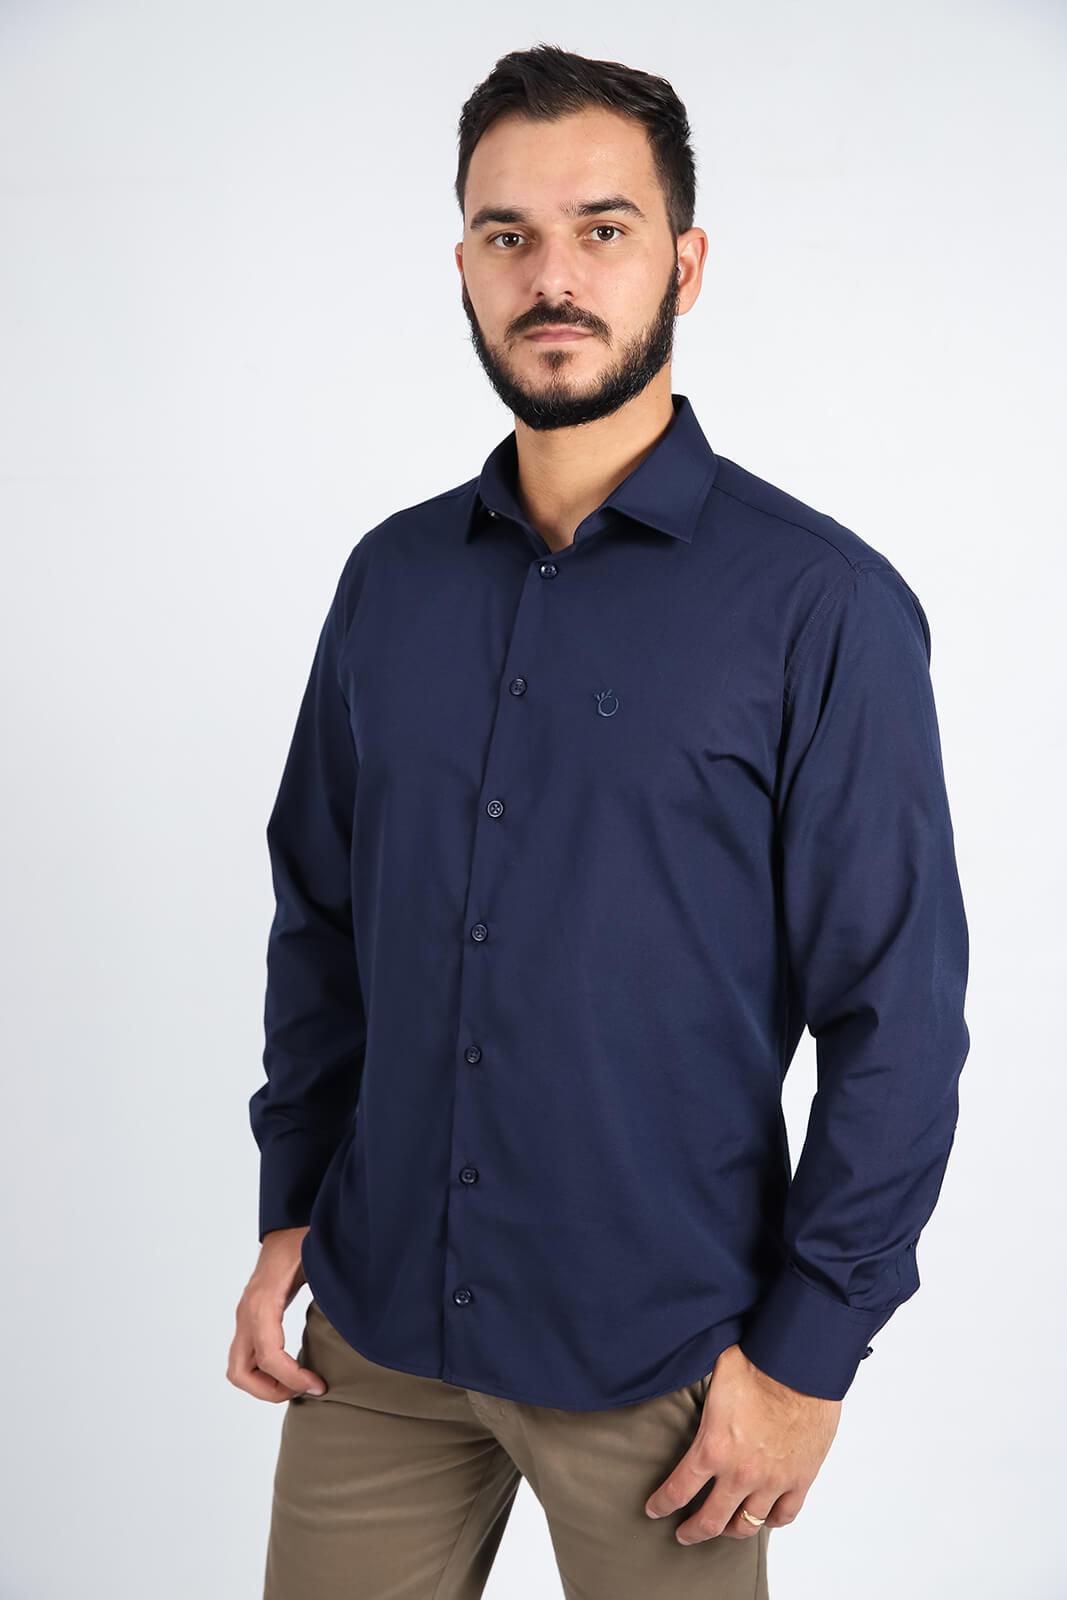 Camisa Social Slim Masculina Lisa Manga Longa Uniforme